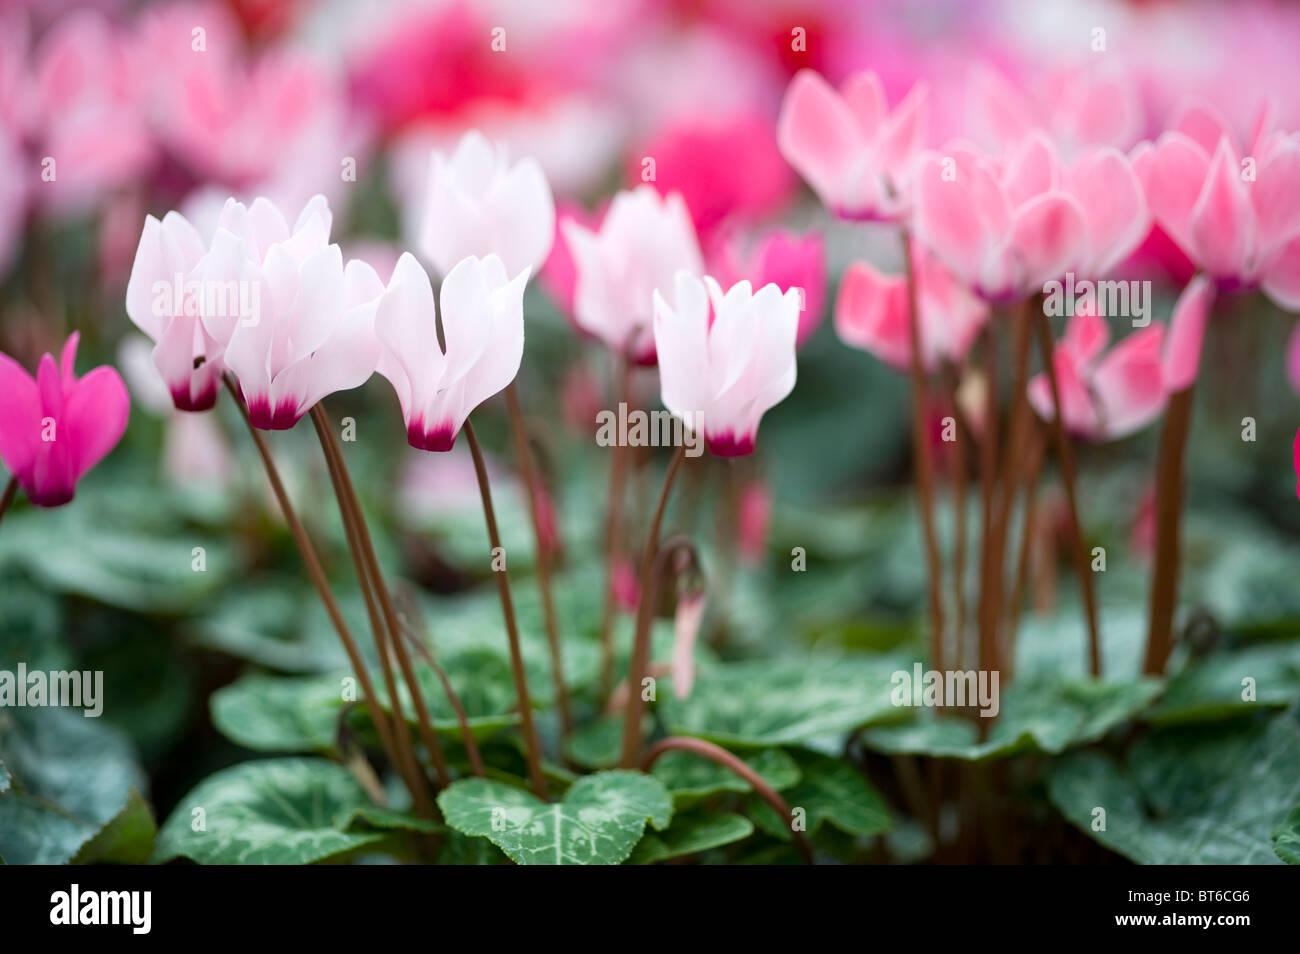 cyclamen flowers in autumn - Stock Image